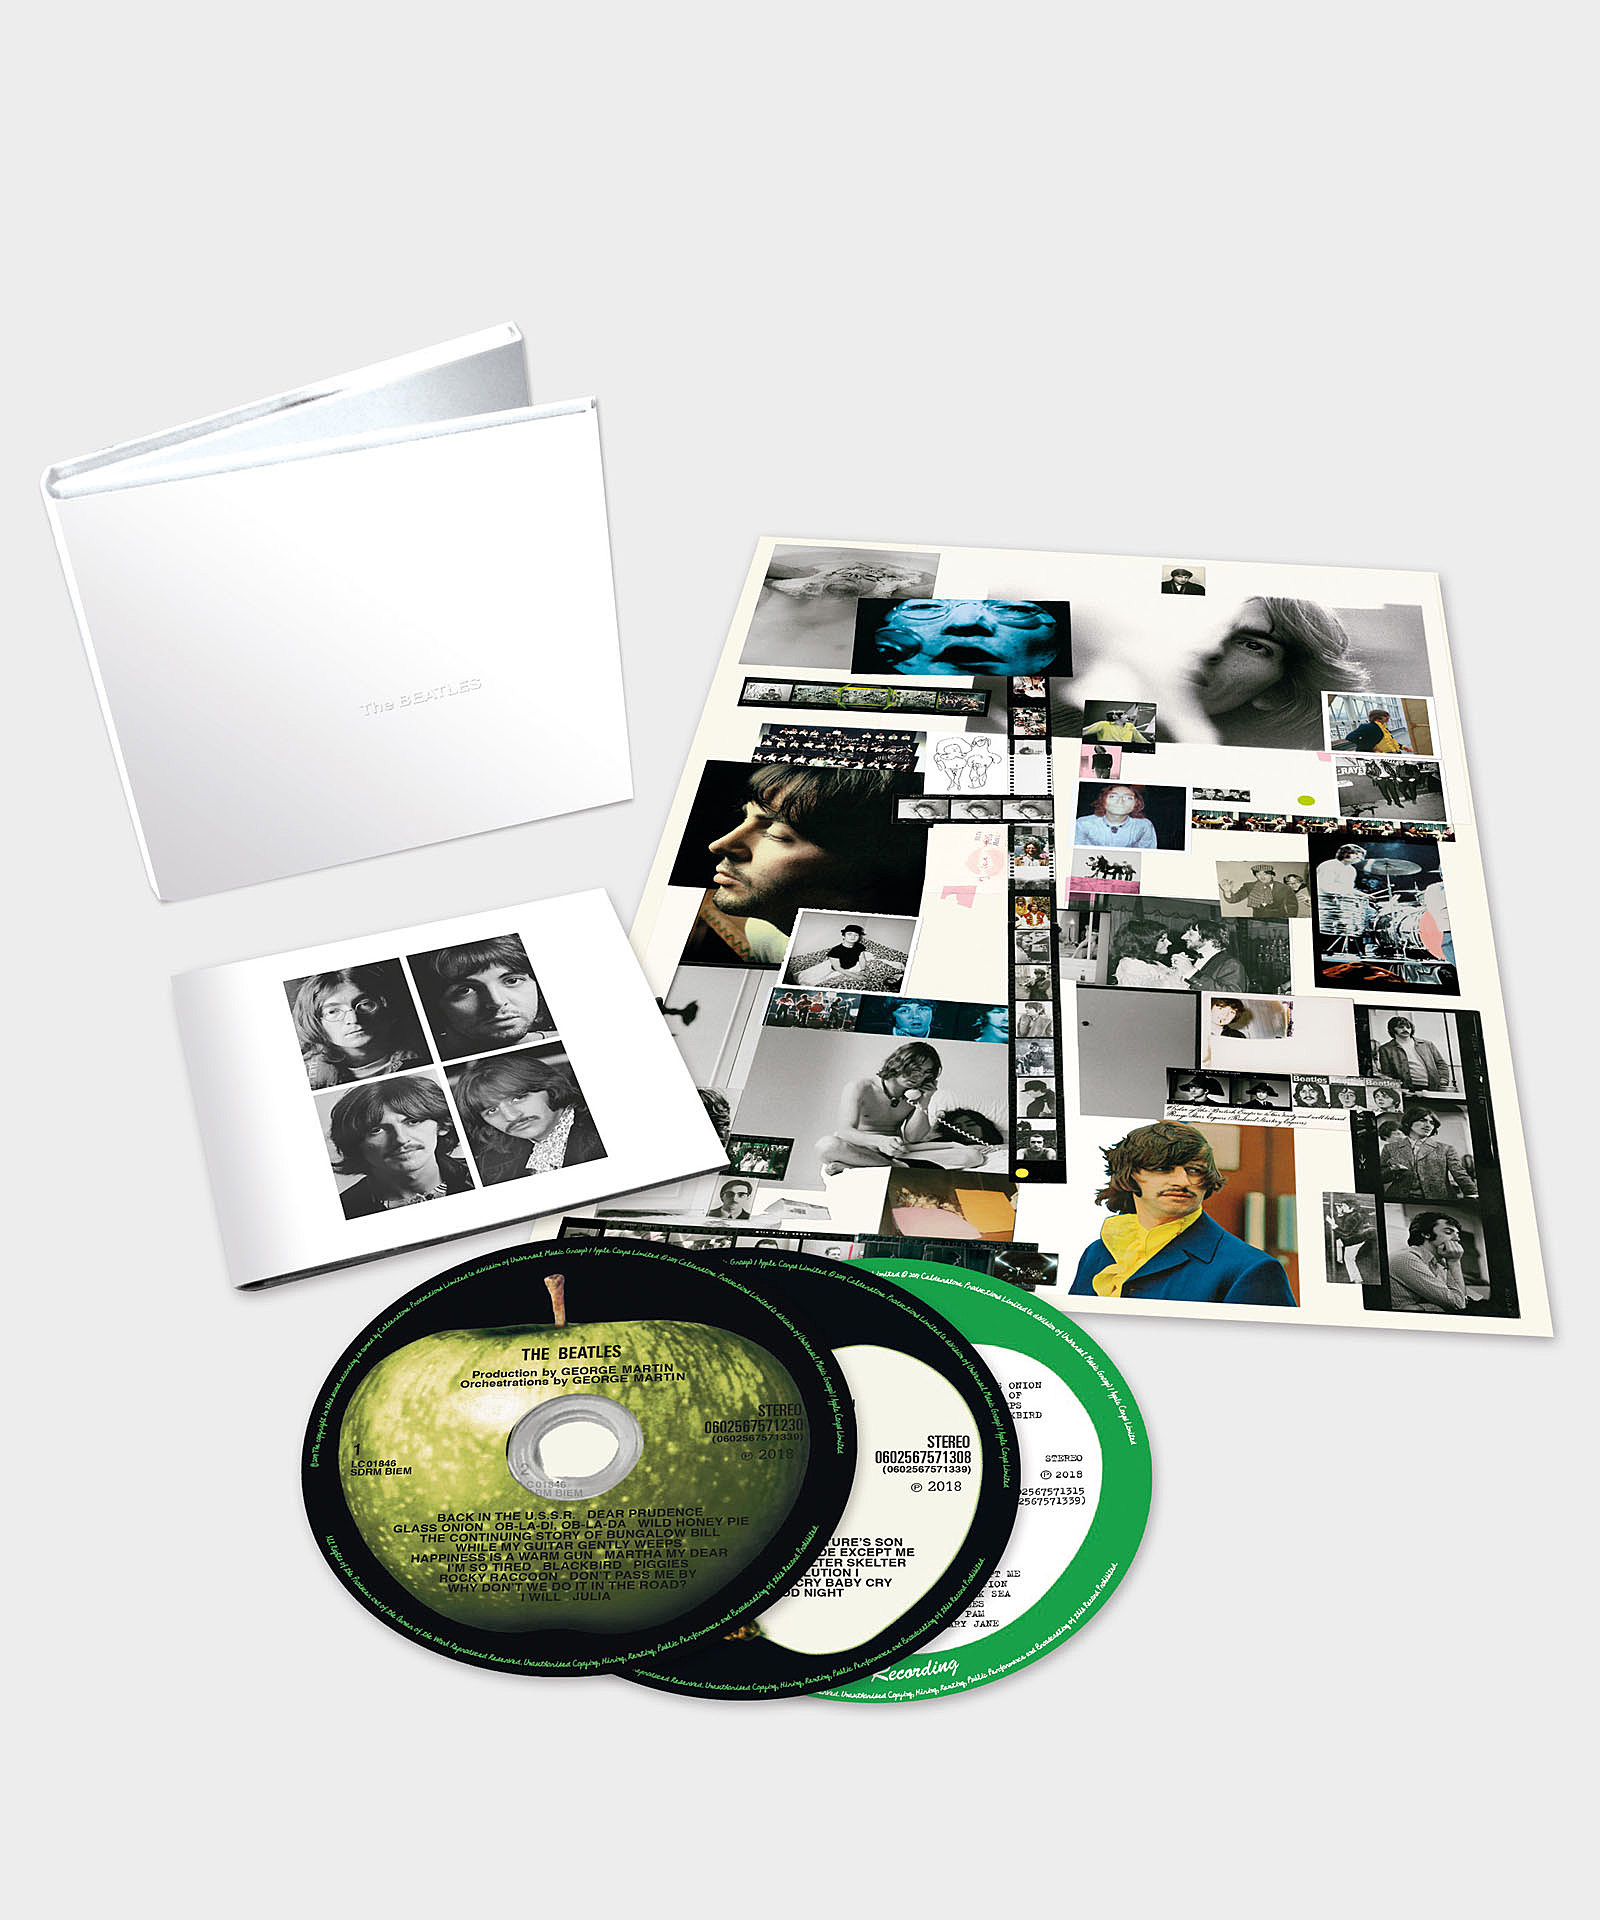 Beatles White Album Expanded Version Announced